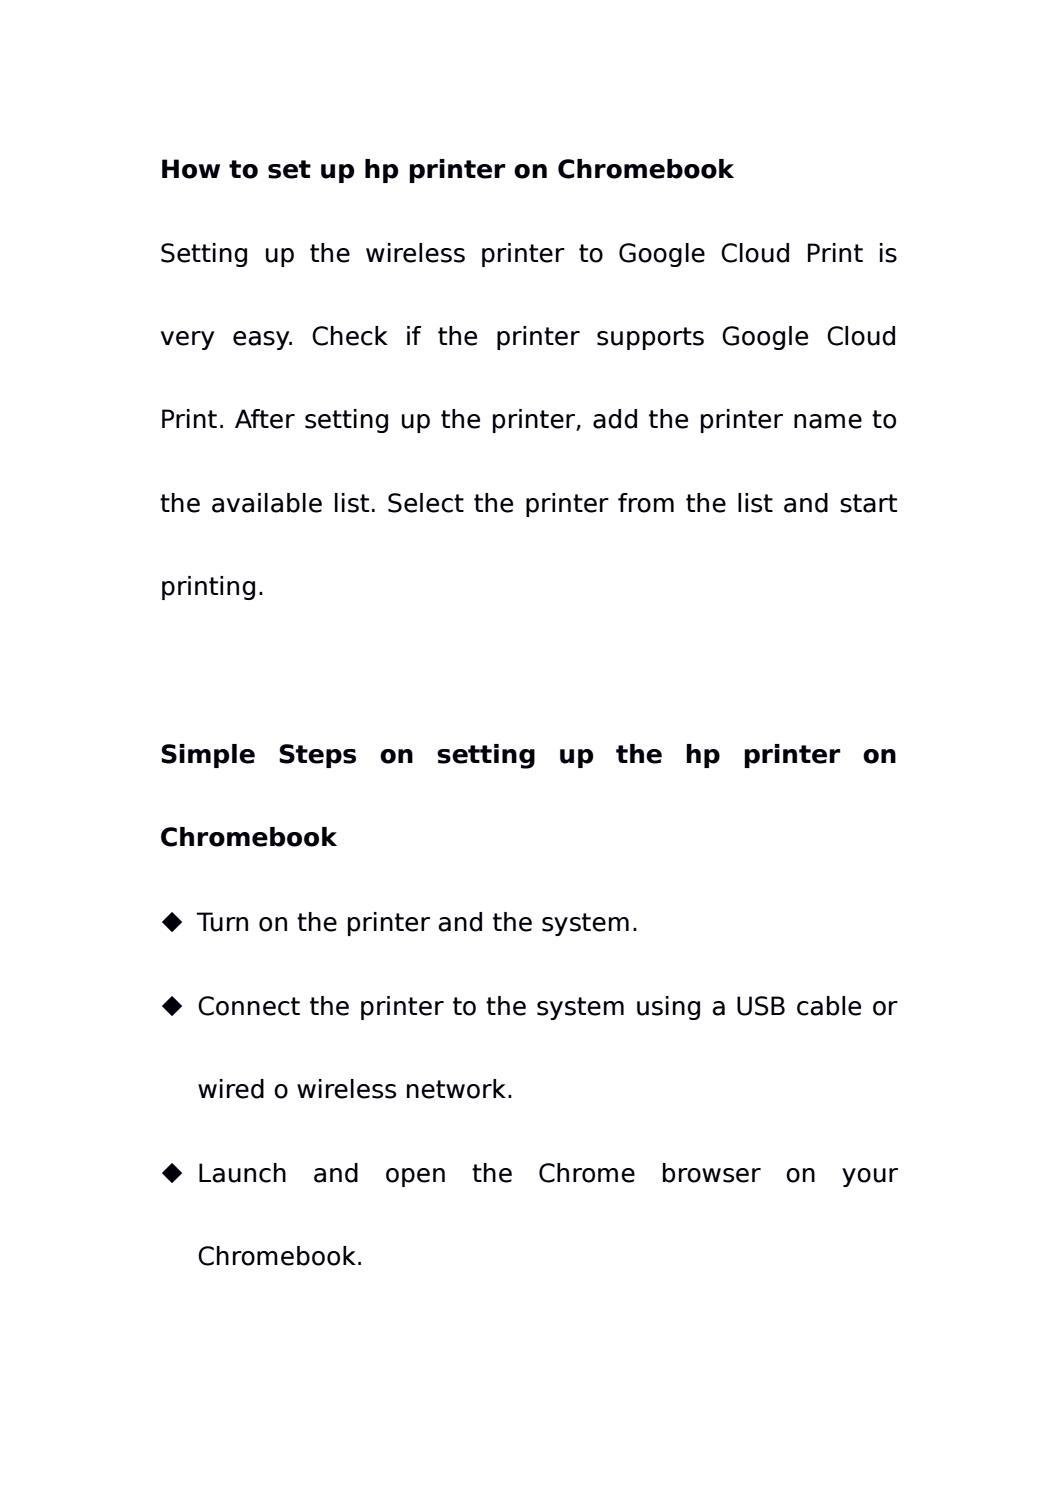 How to set up hp printer on Chromebook by sandra carol - issuu